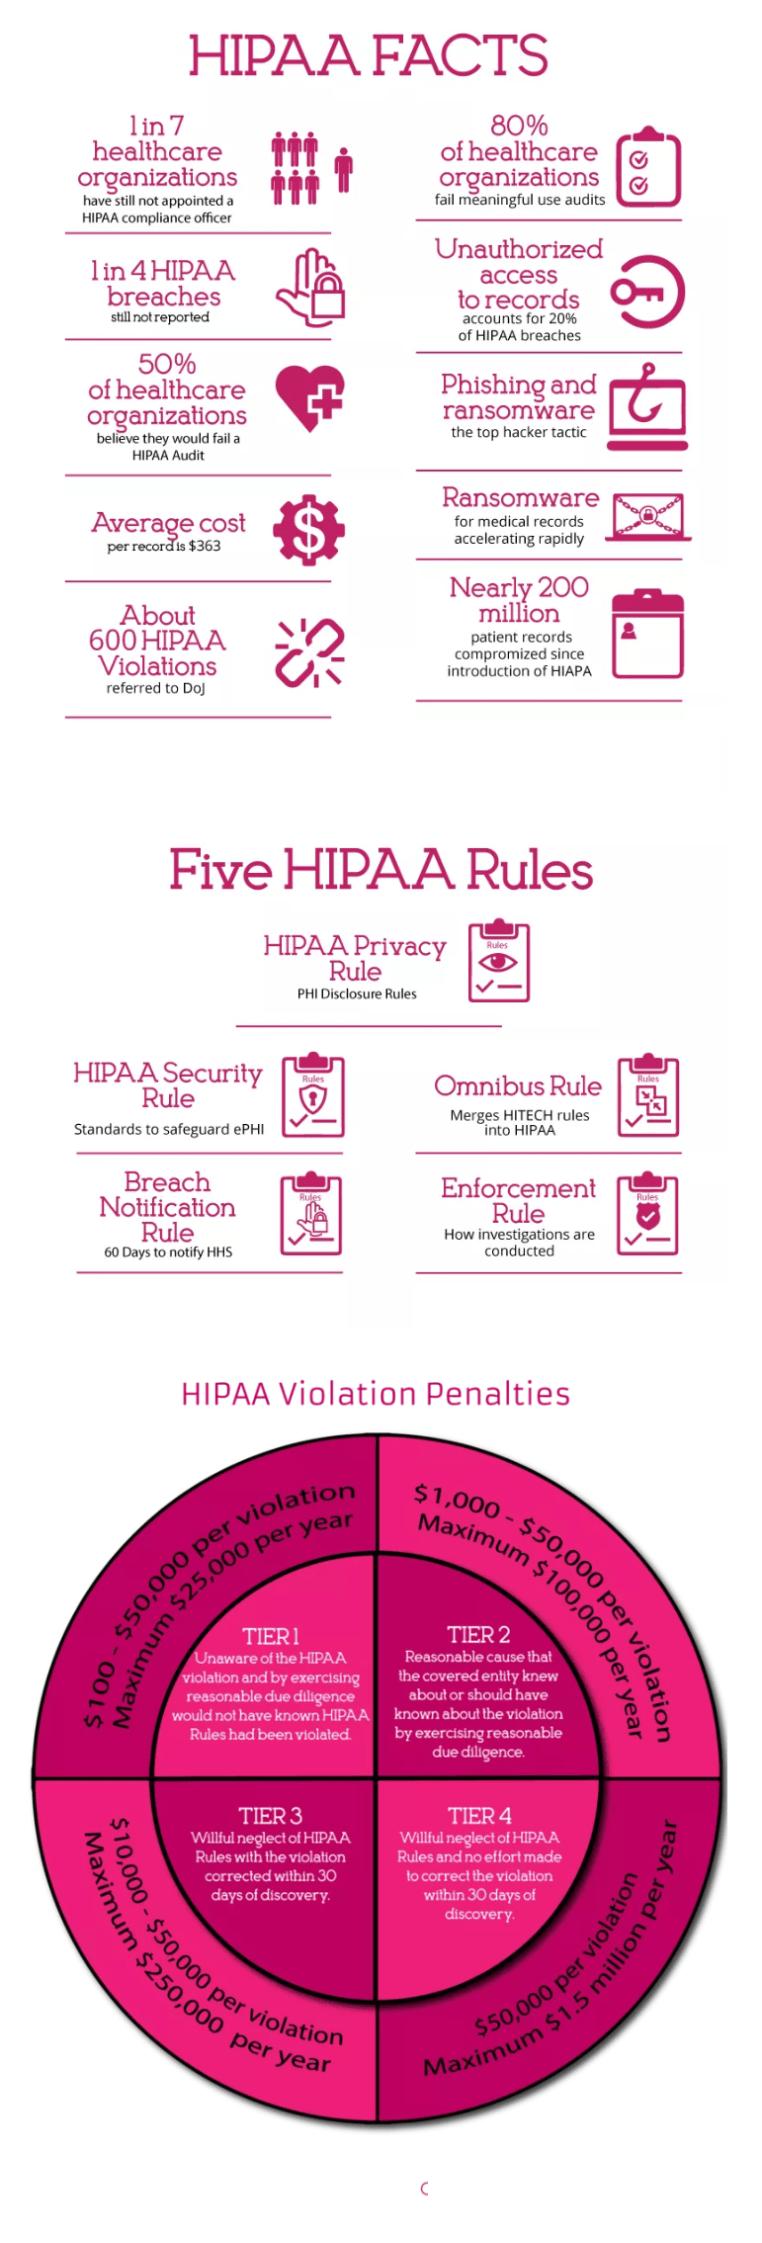 hipaa rules facts violations - HIPAA compliance checklist 2019